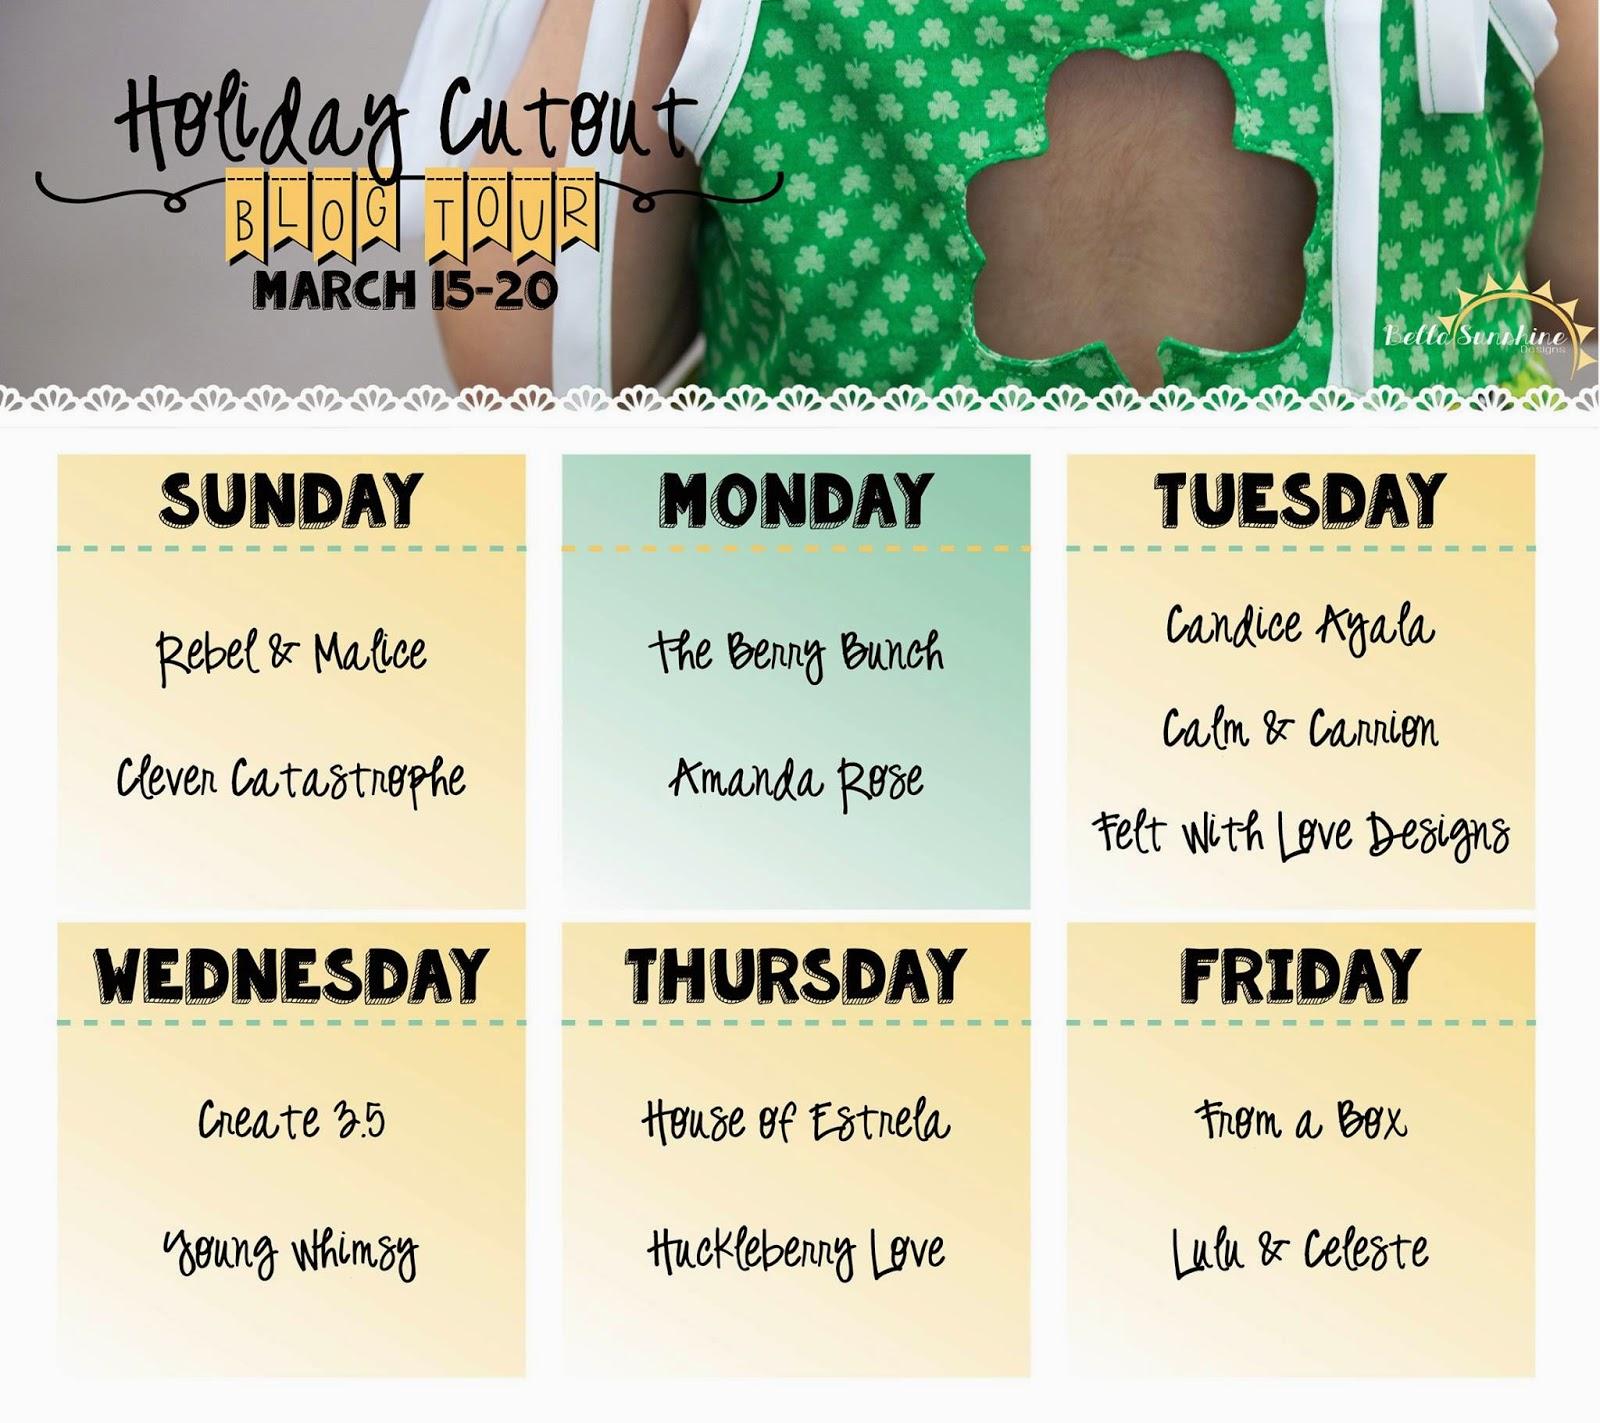 THe Berry Bunch: Bella Sunshine Design Holiday Cutout Dress: Blog Tour